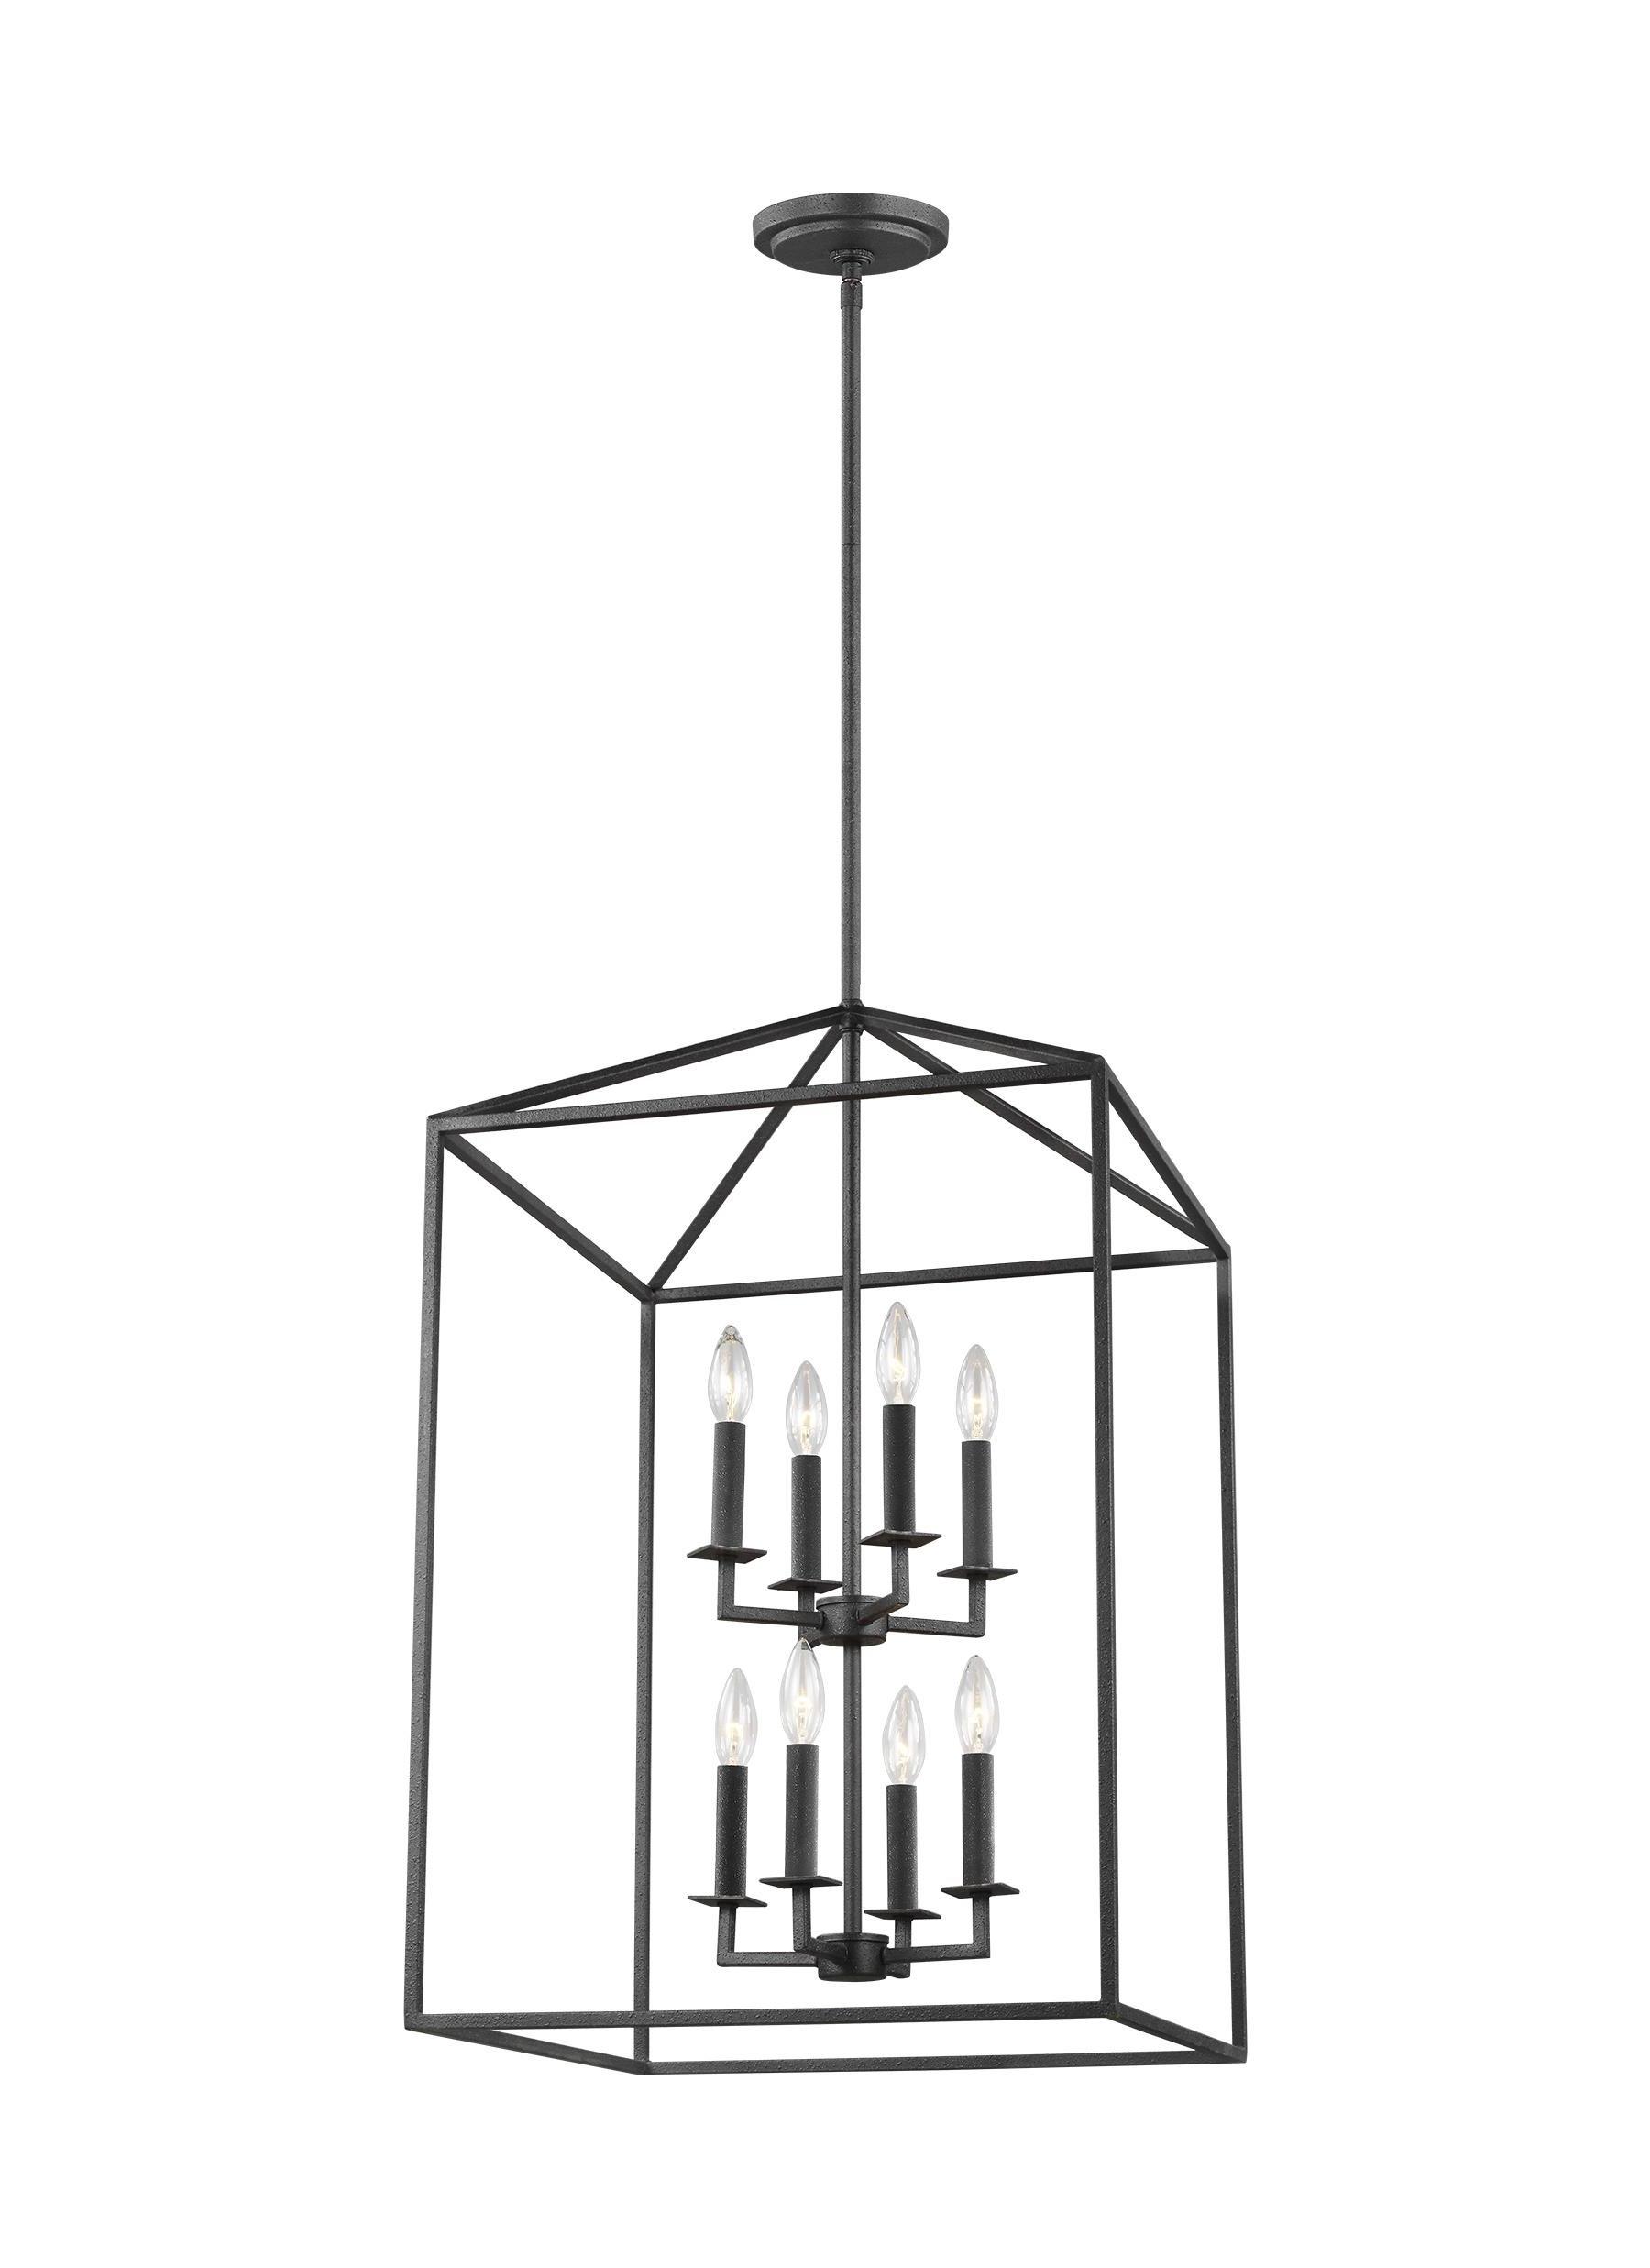 Most Popular Odie 8 Light Lantern Square / Rectangle Pendant In Odie 8 Light Lantern Square / Rectangle Pendants (Gallery 1 of 20)